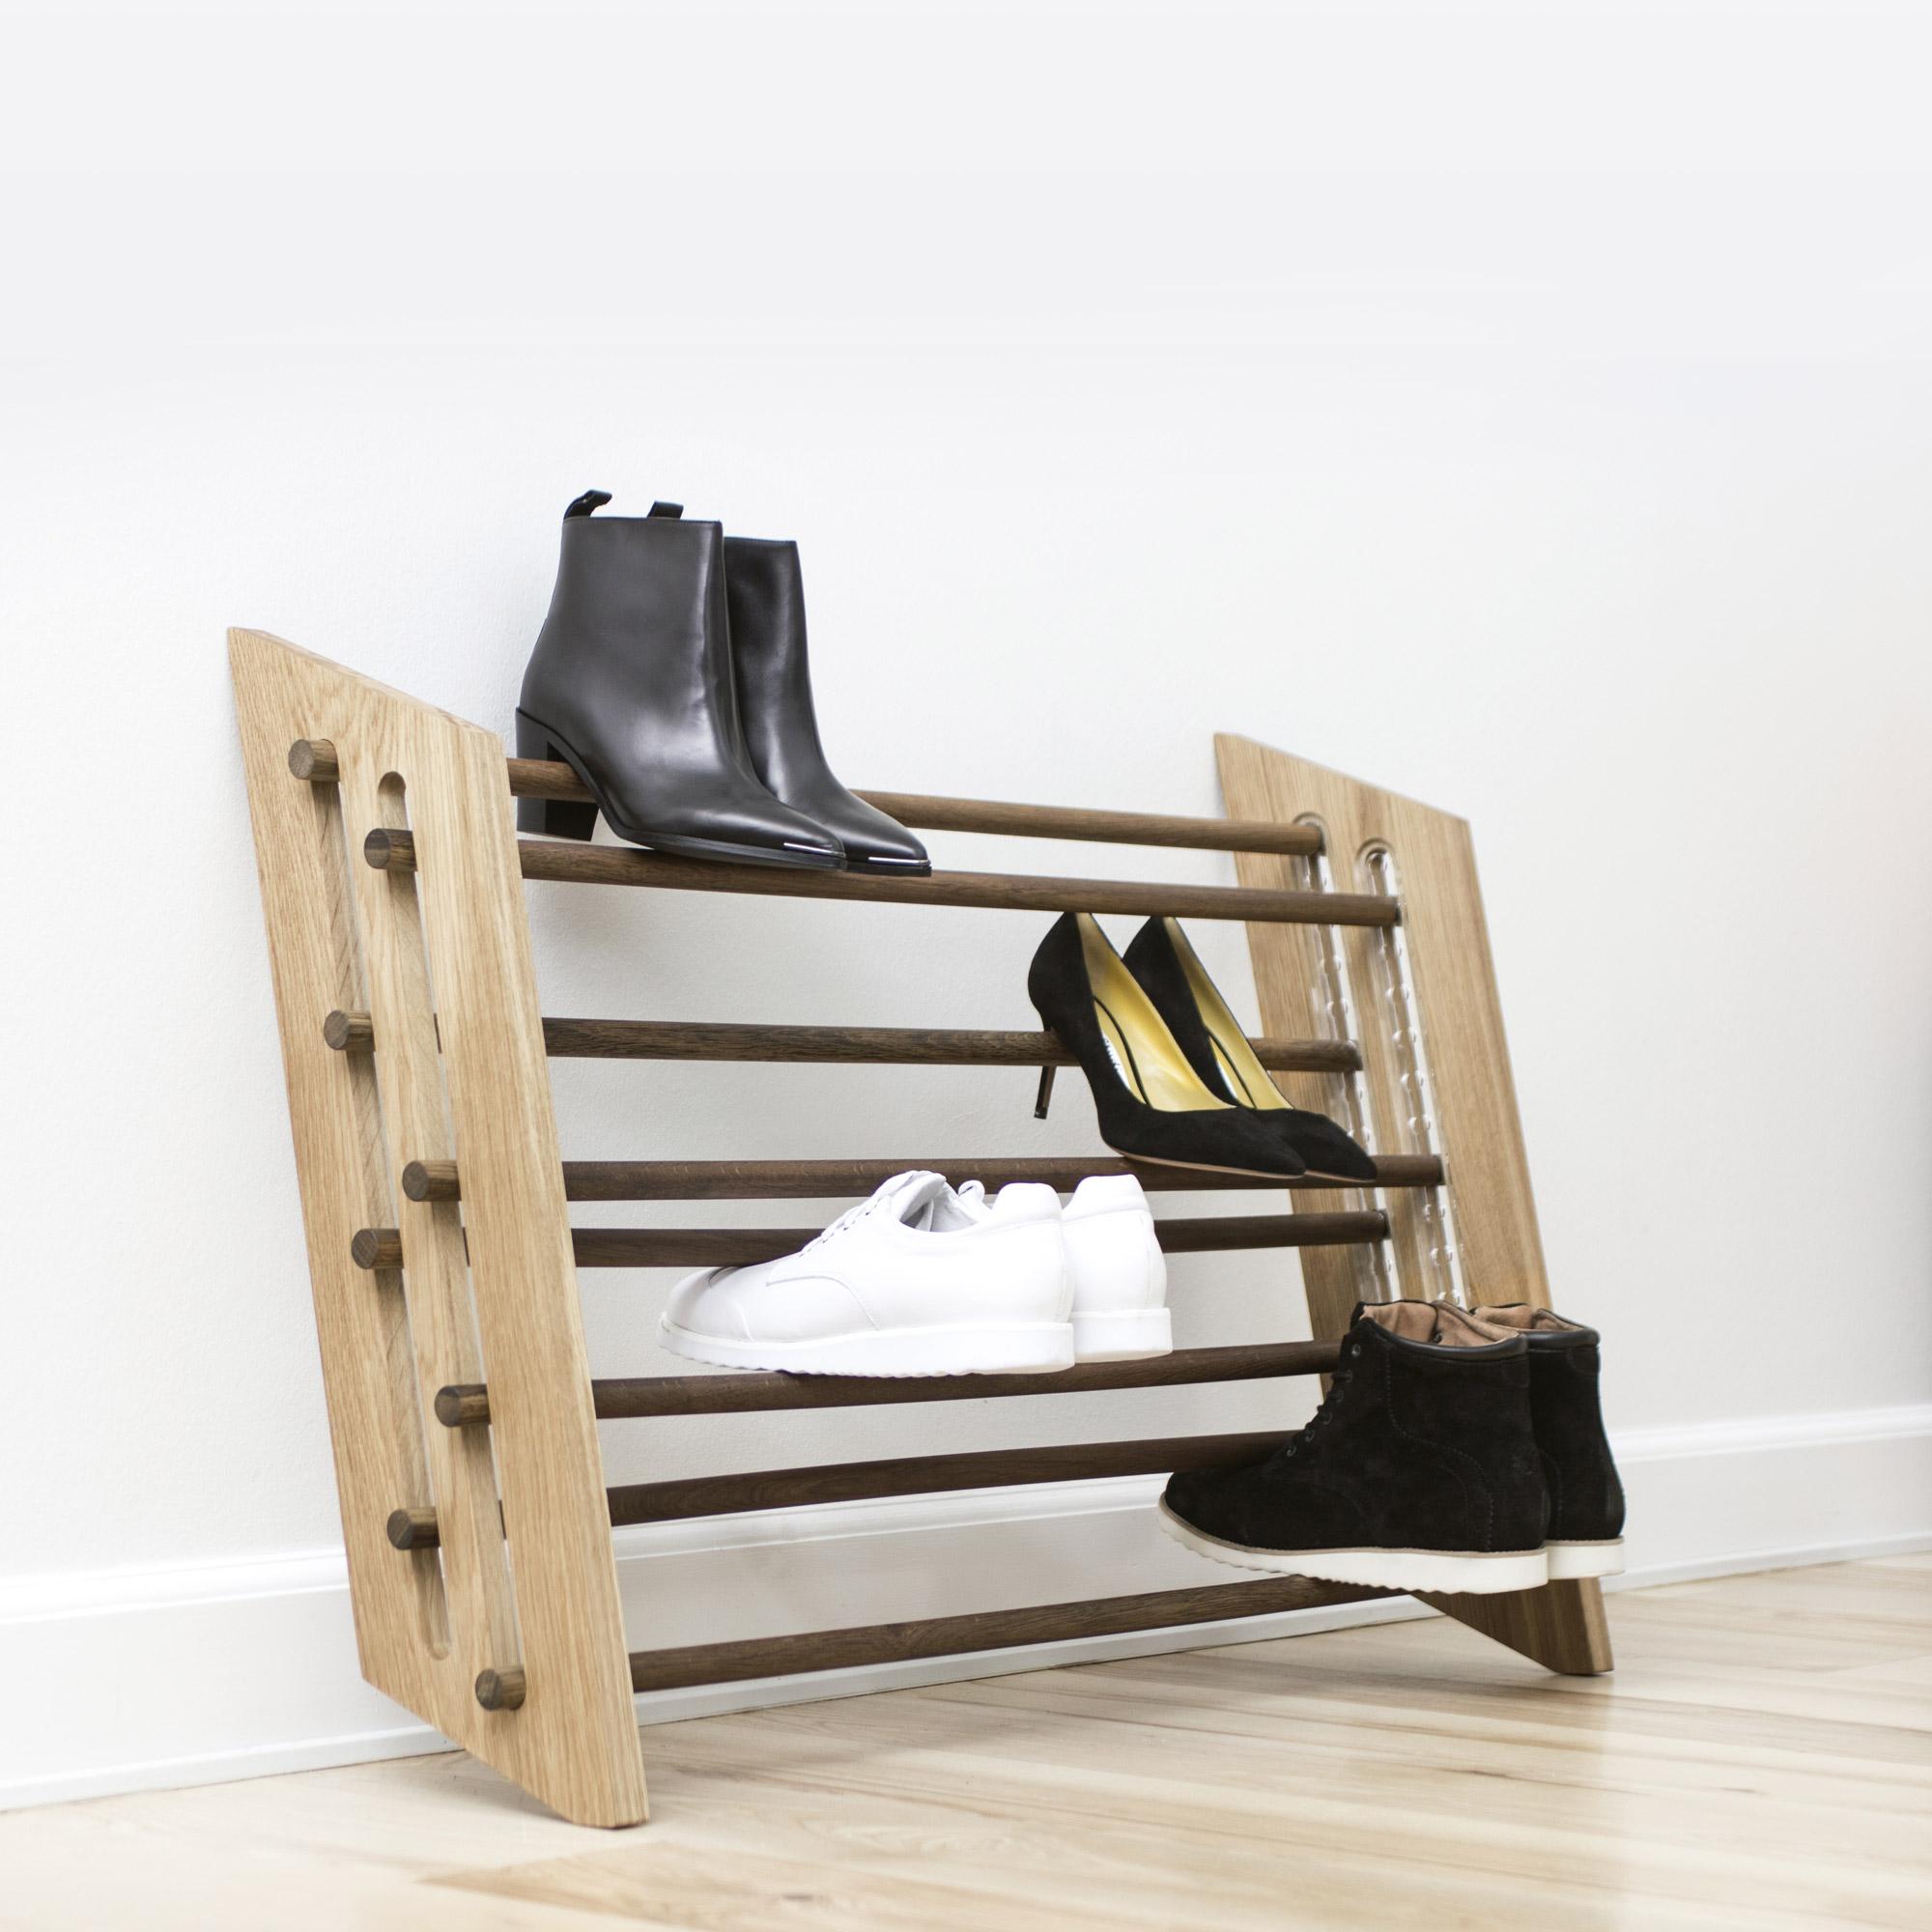 schuhregal moodstand von roon rahn i holzdesignpur. Black Bedroom Furniture Sets. Home Design Ideas